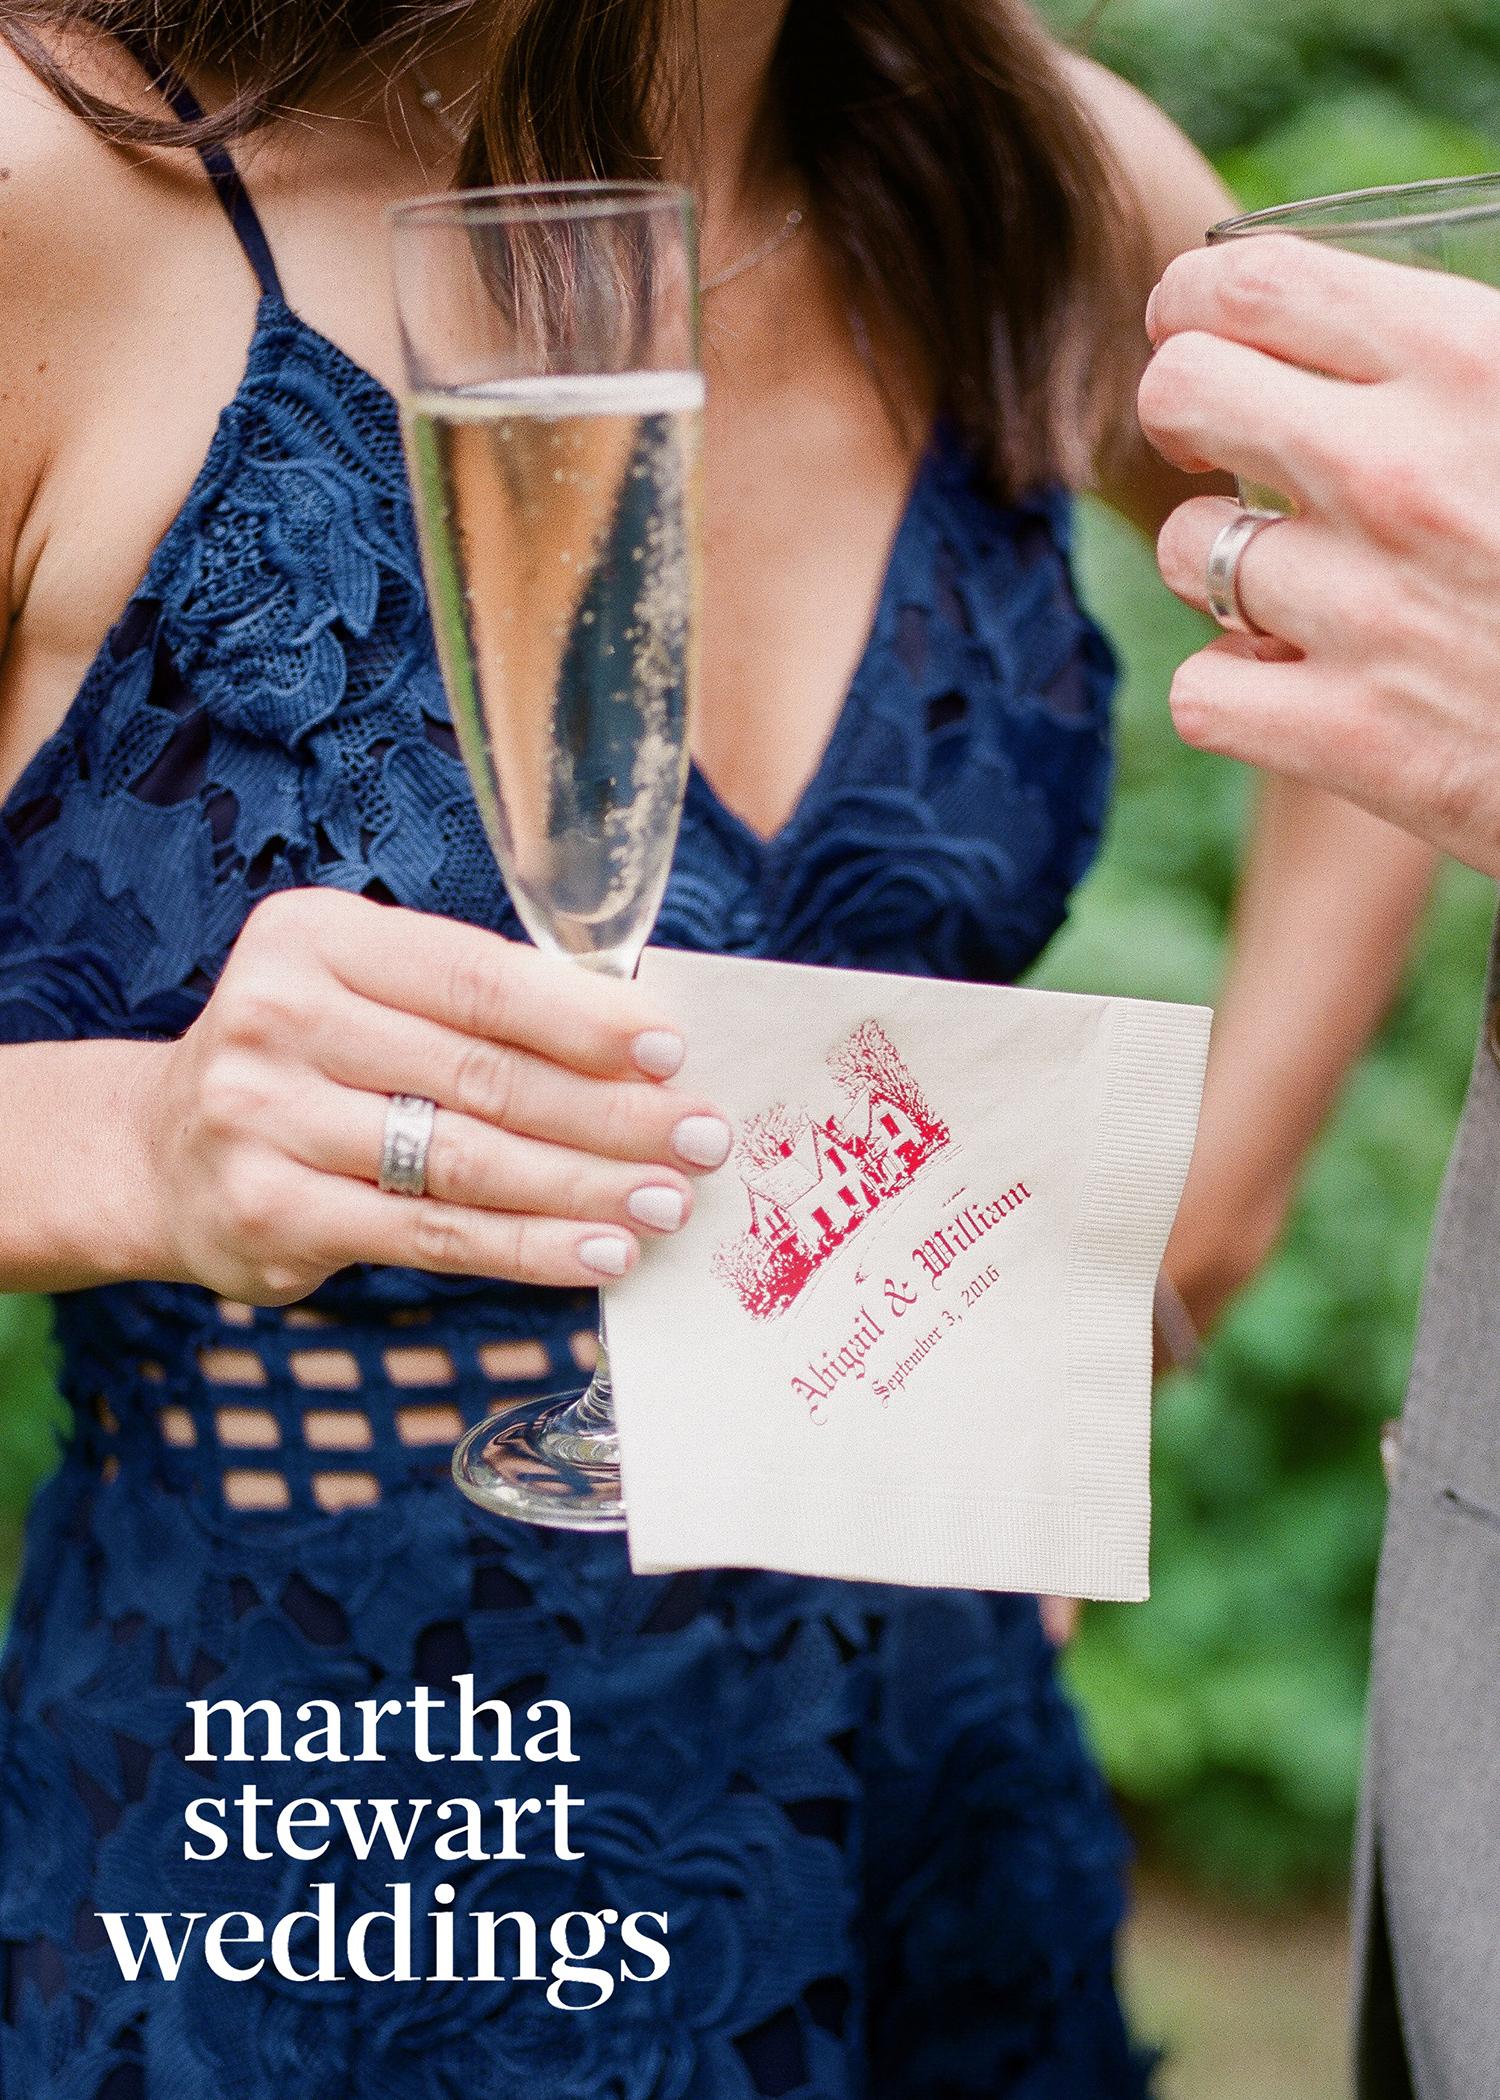 abby elliott bill kennedy wedding napkin